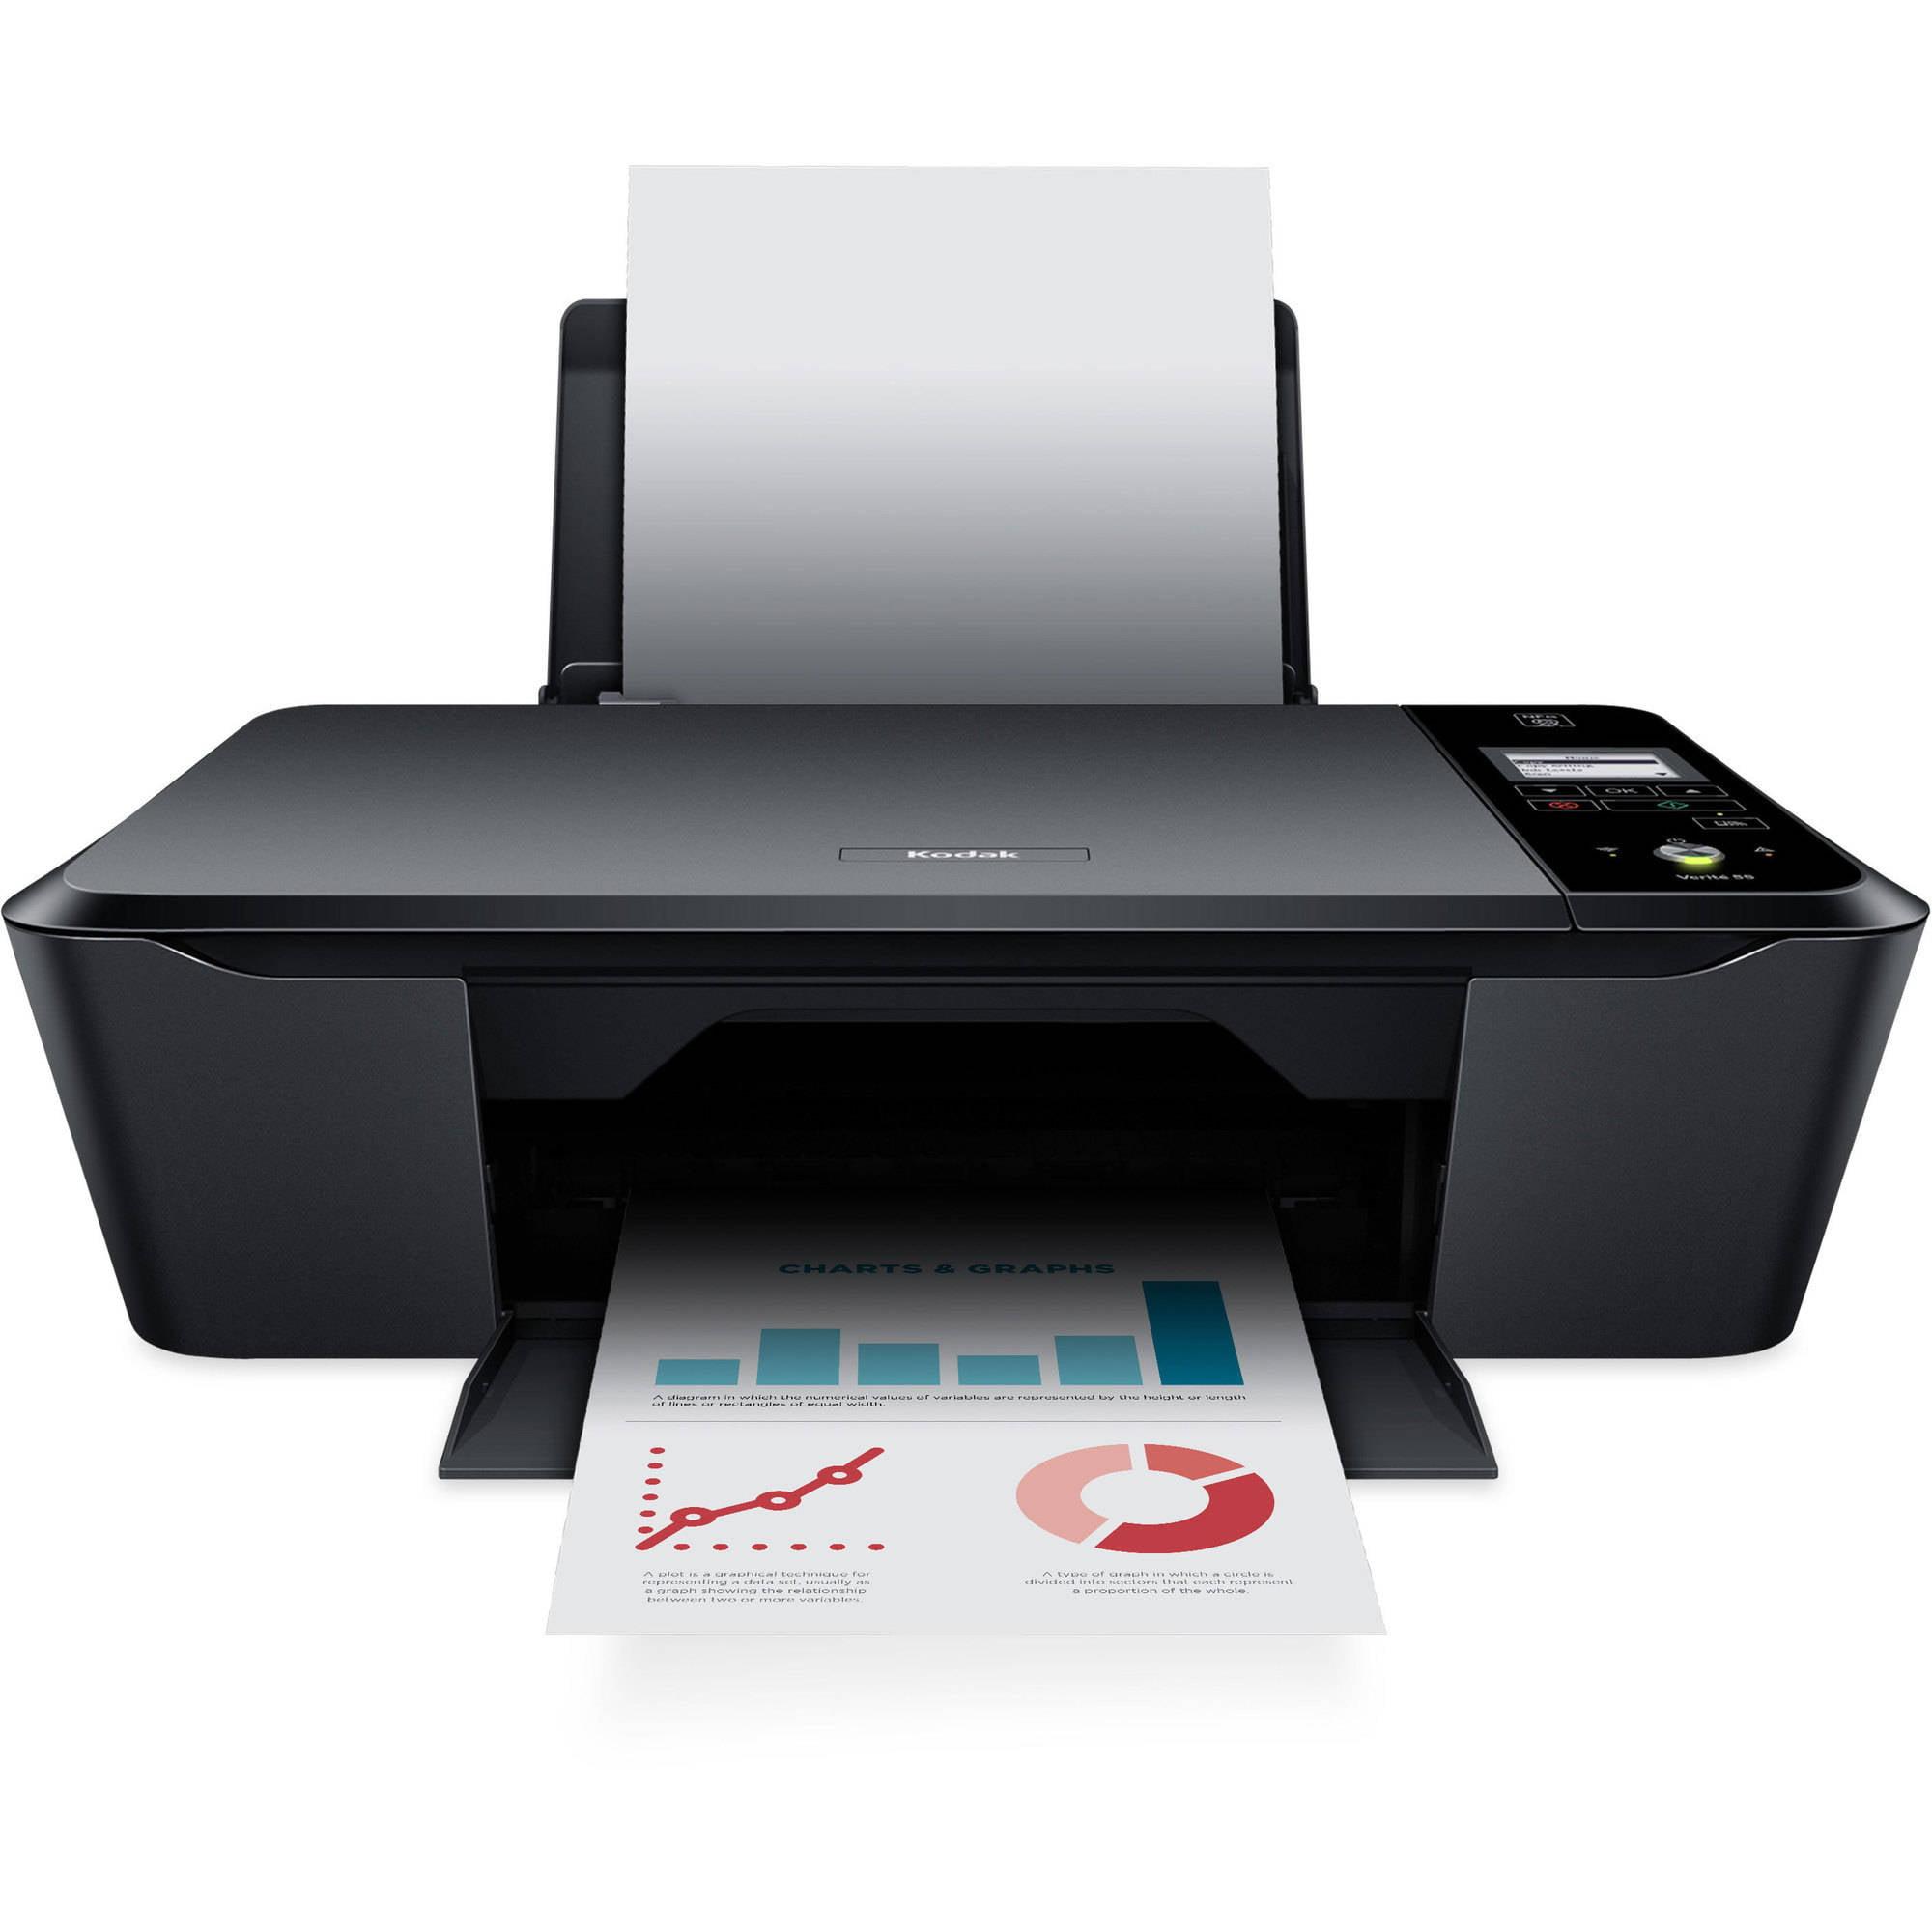 KODAK Verite 55 Wireless All-In-One Printer